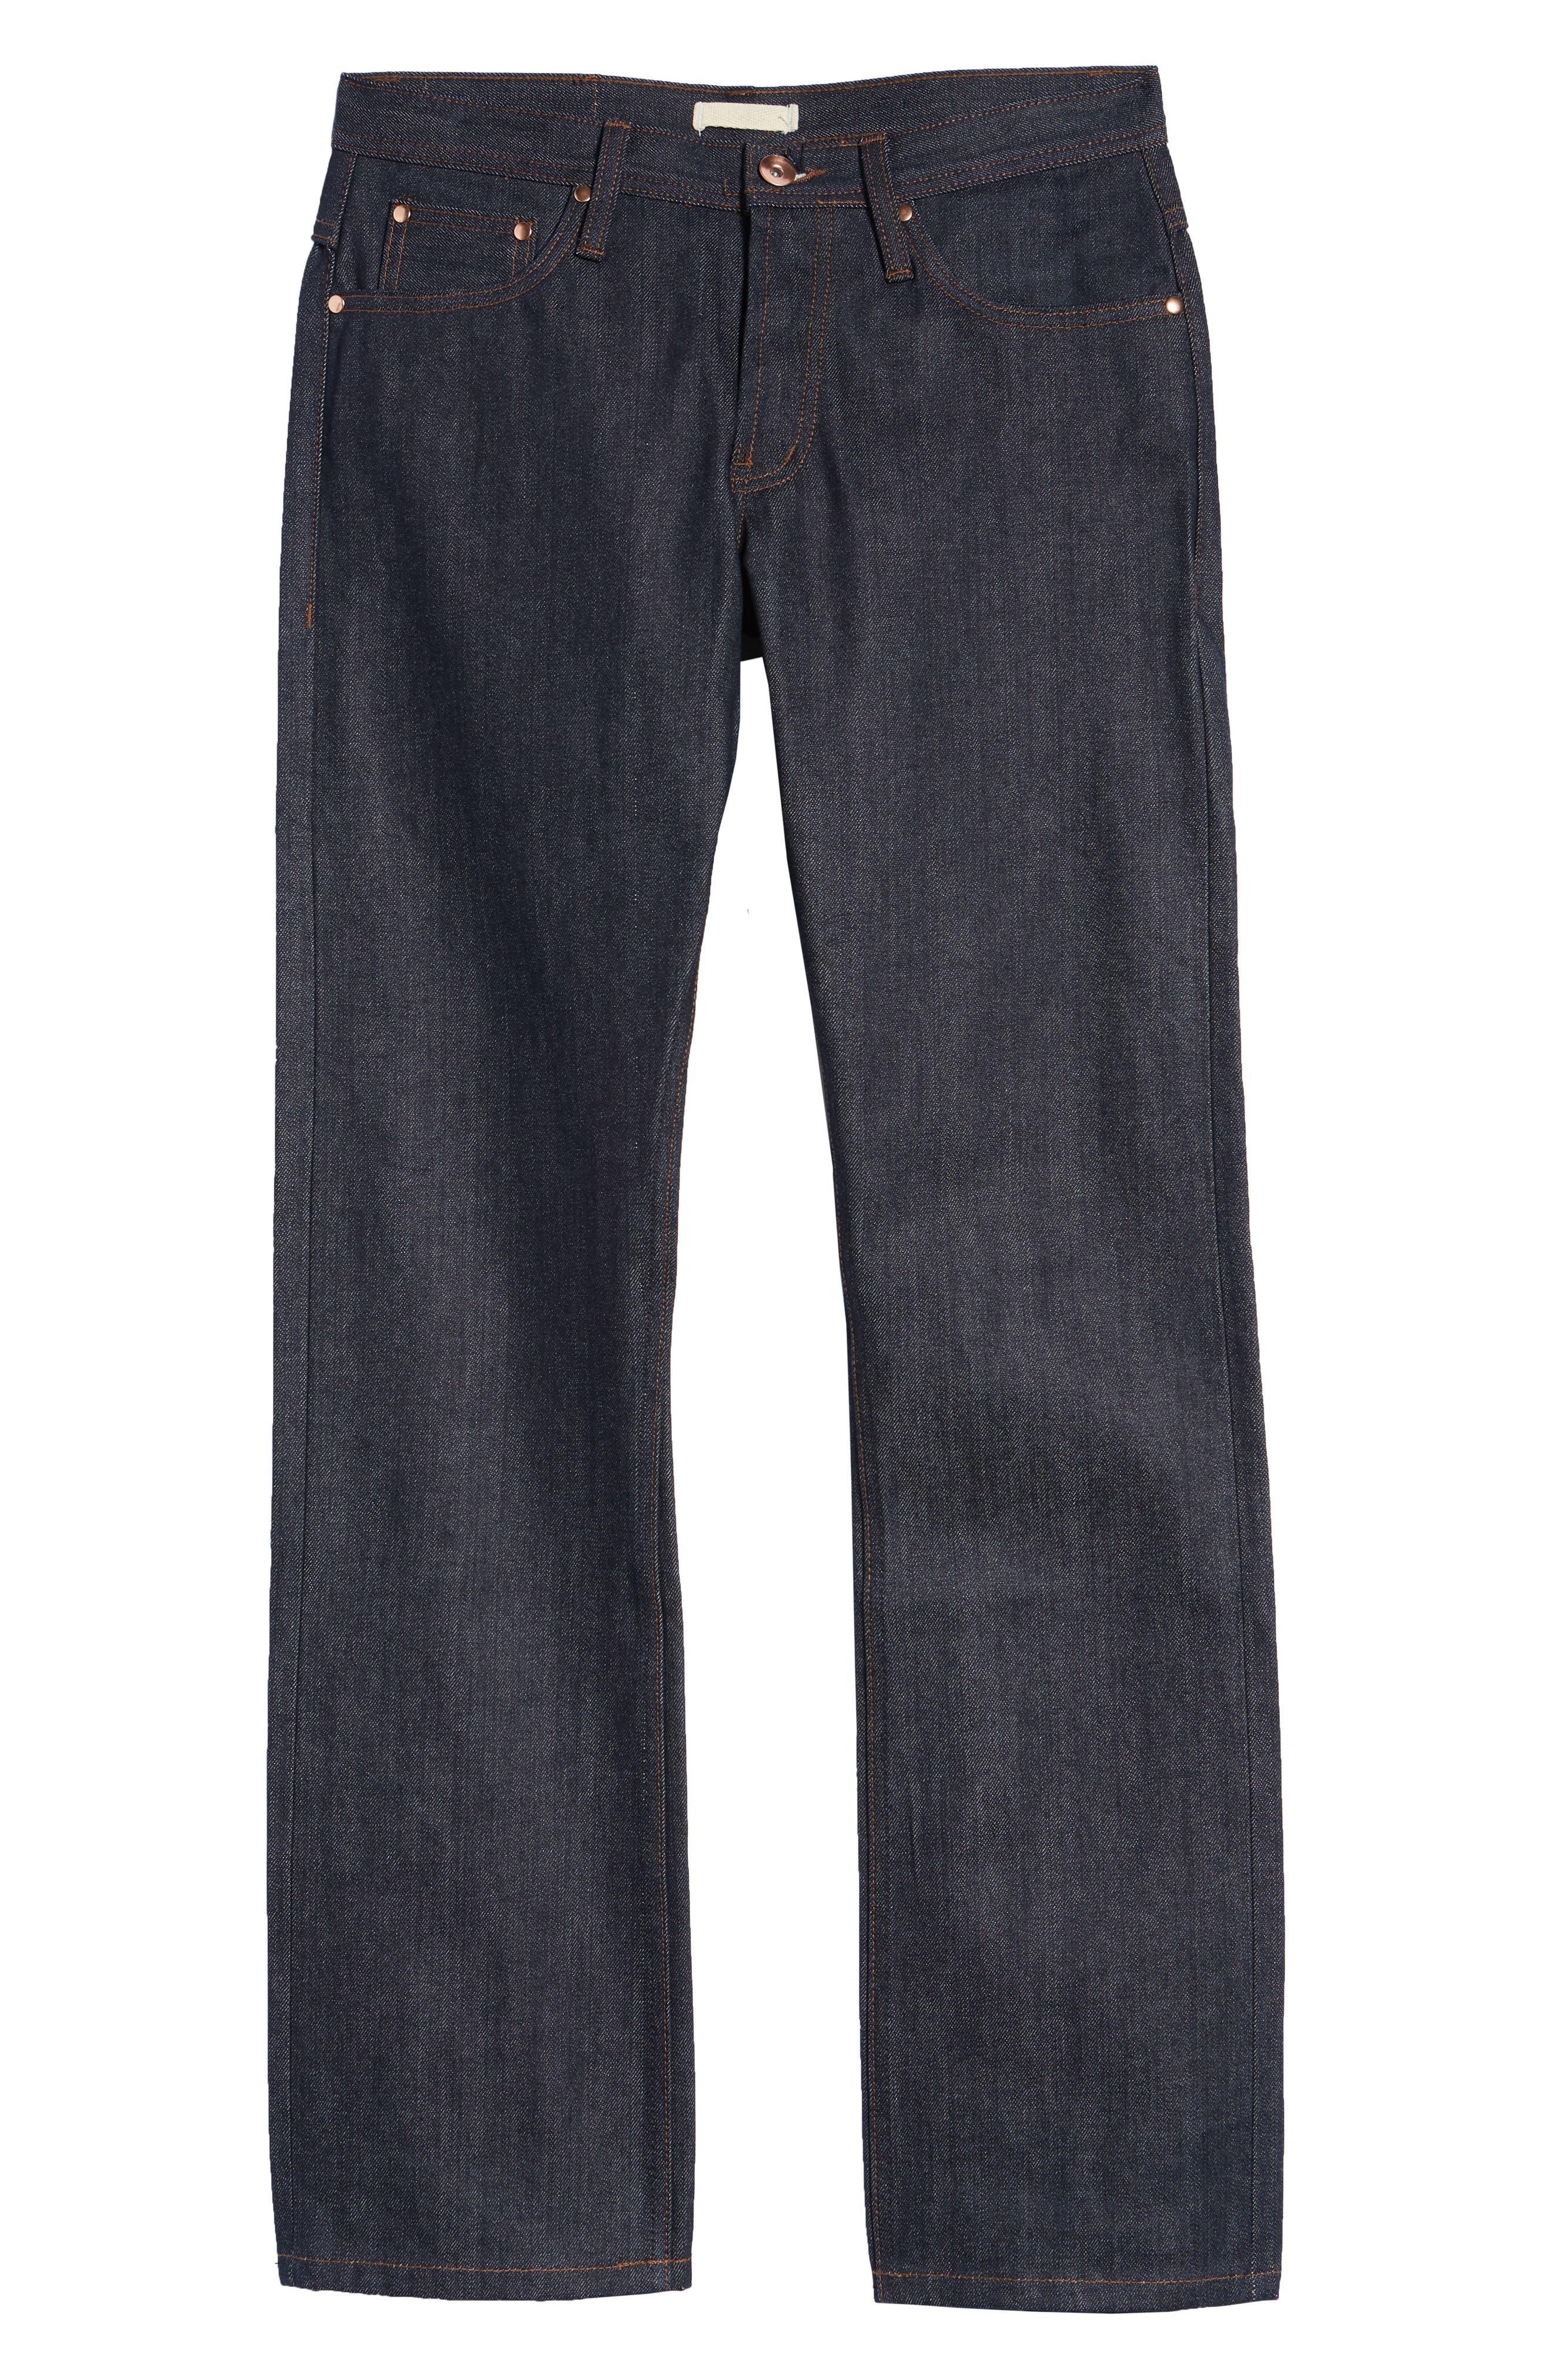 UB301 Straight Leg Raw Selvedge Jeans,                             Alternate thumbnail 7, color,                             INDIGO